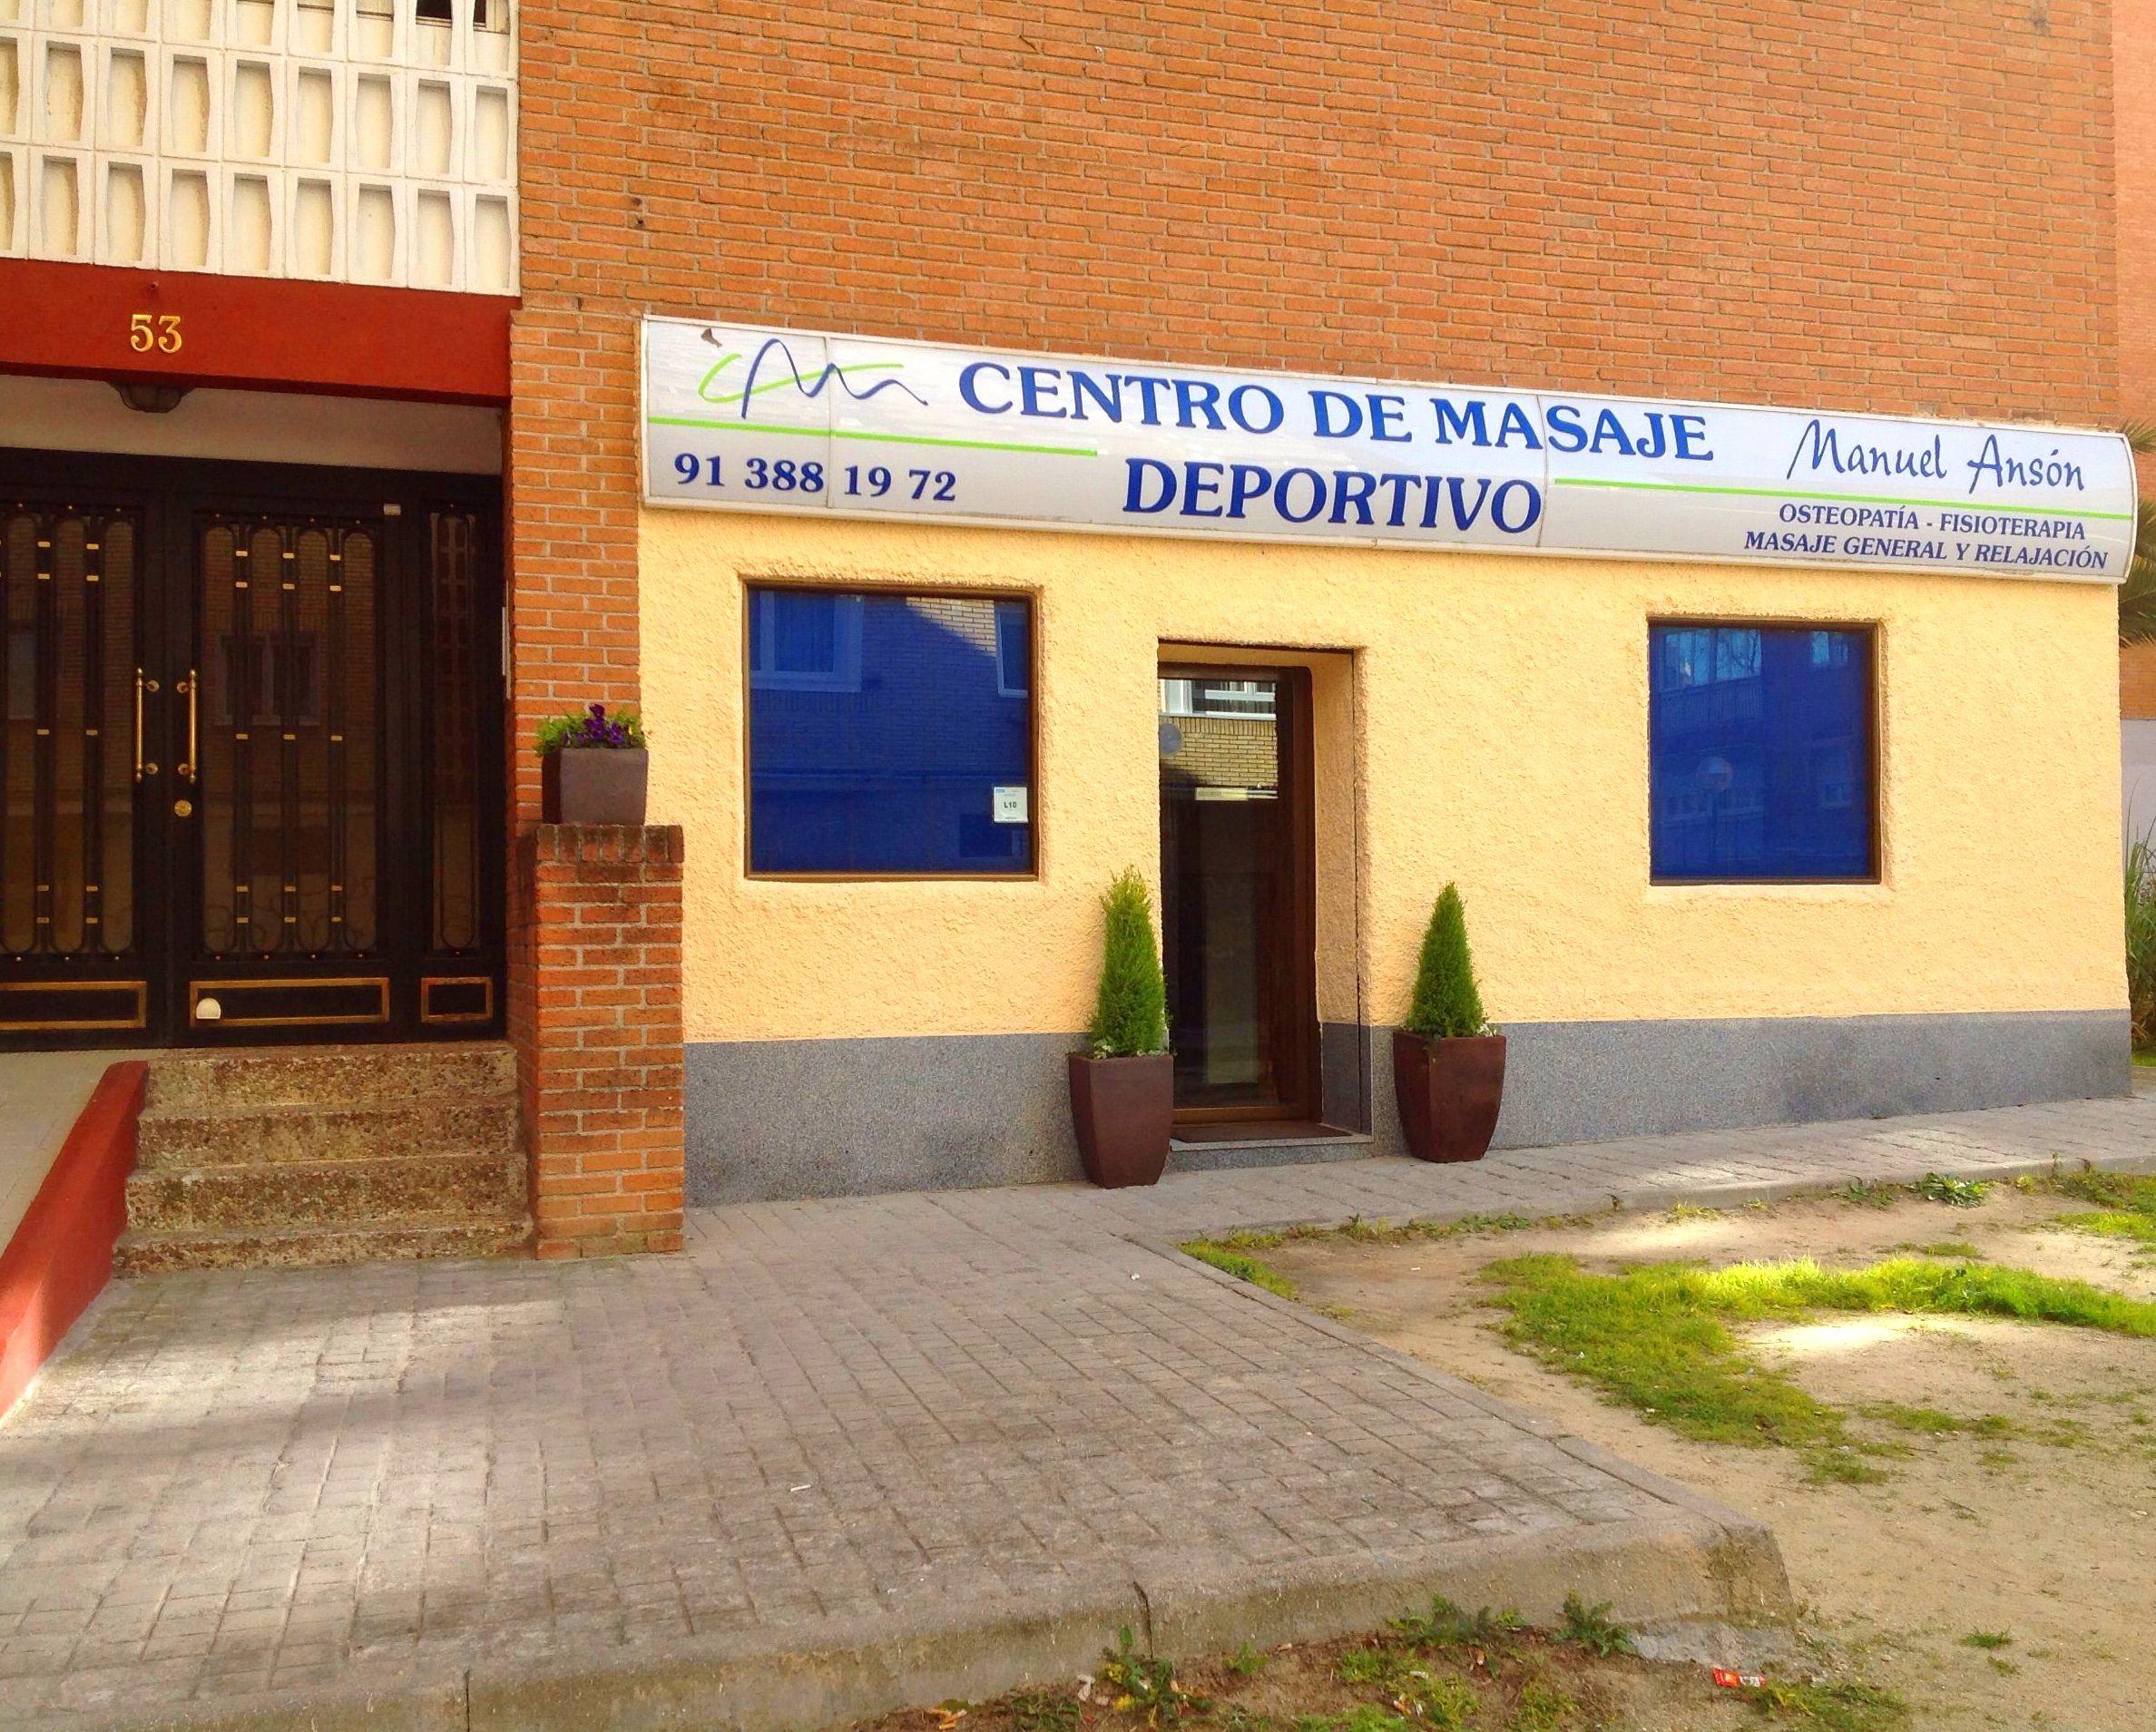 Foto 6 de Fisioterapia en Madrid | Ansón Manuel